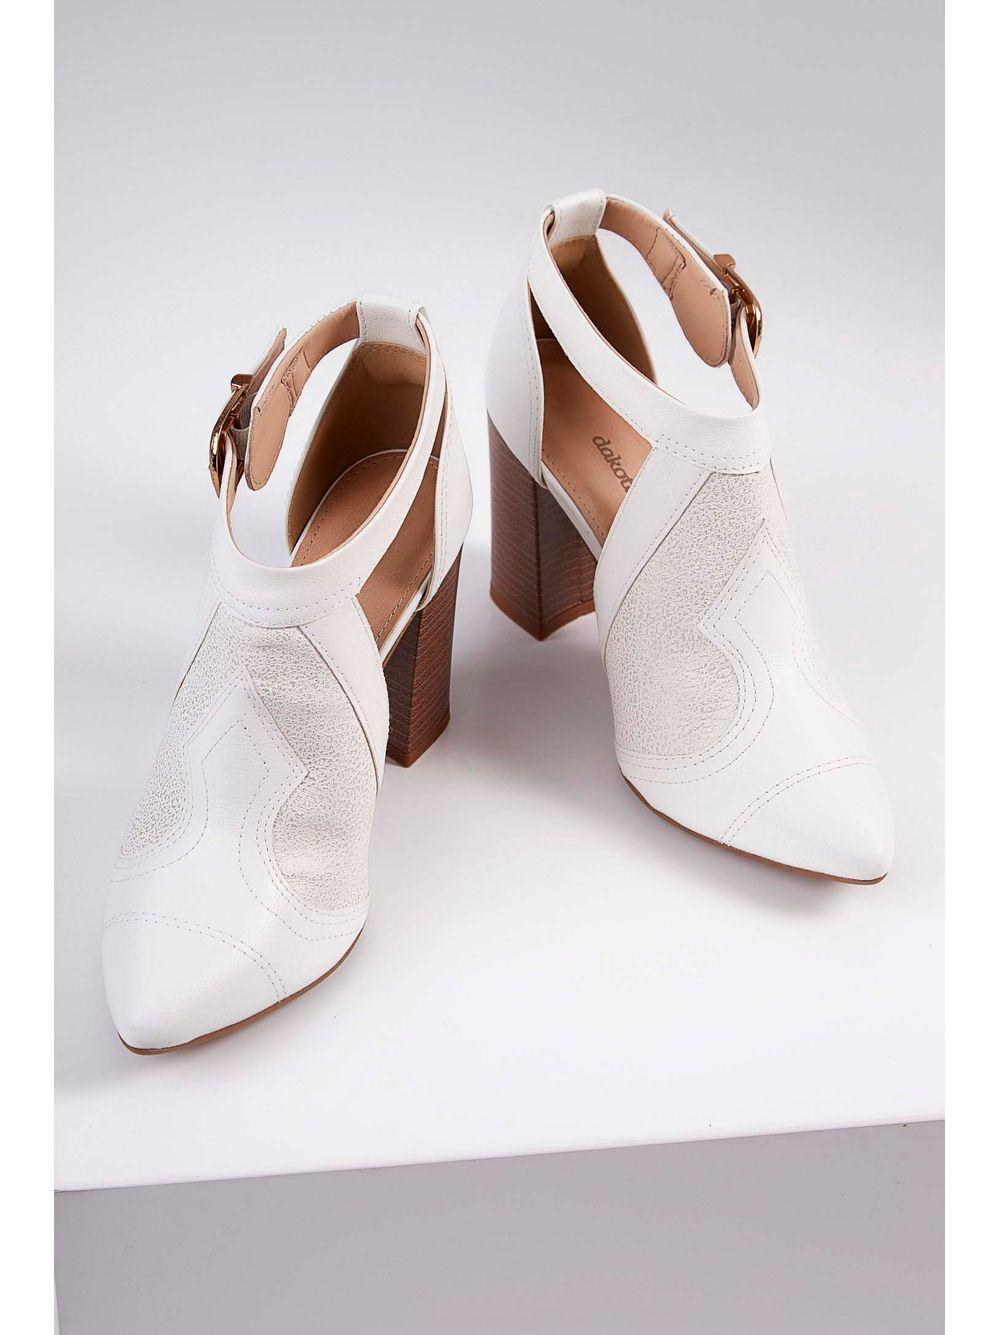 bfe4a3106 Sapato Feminino Dakota Salto Bloco Fivela Branco - pittol